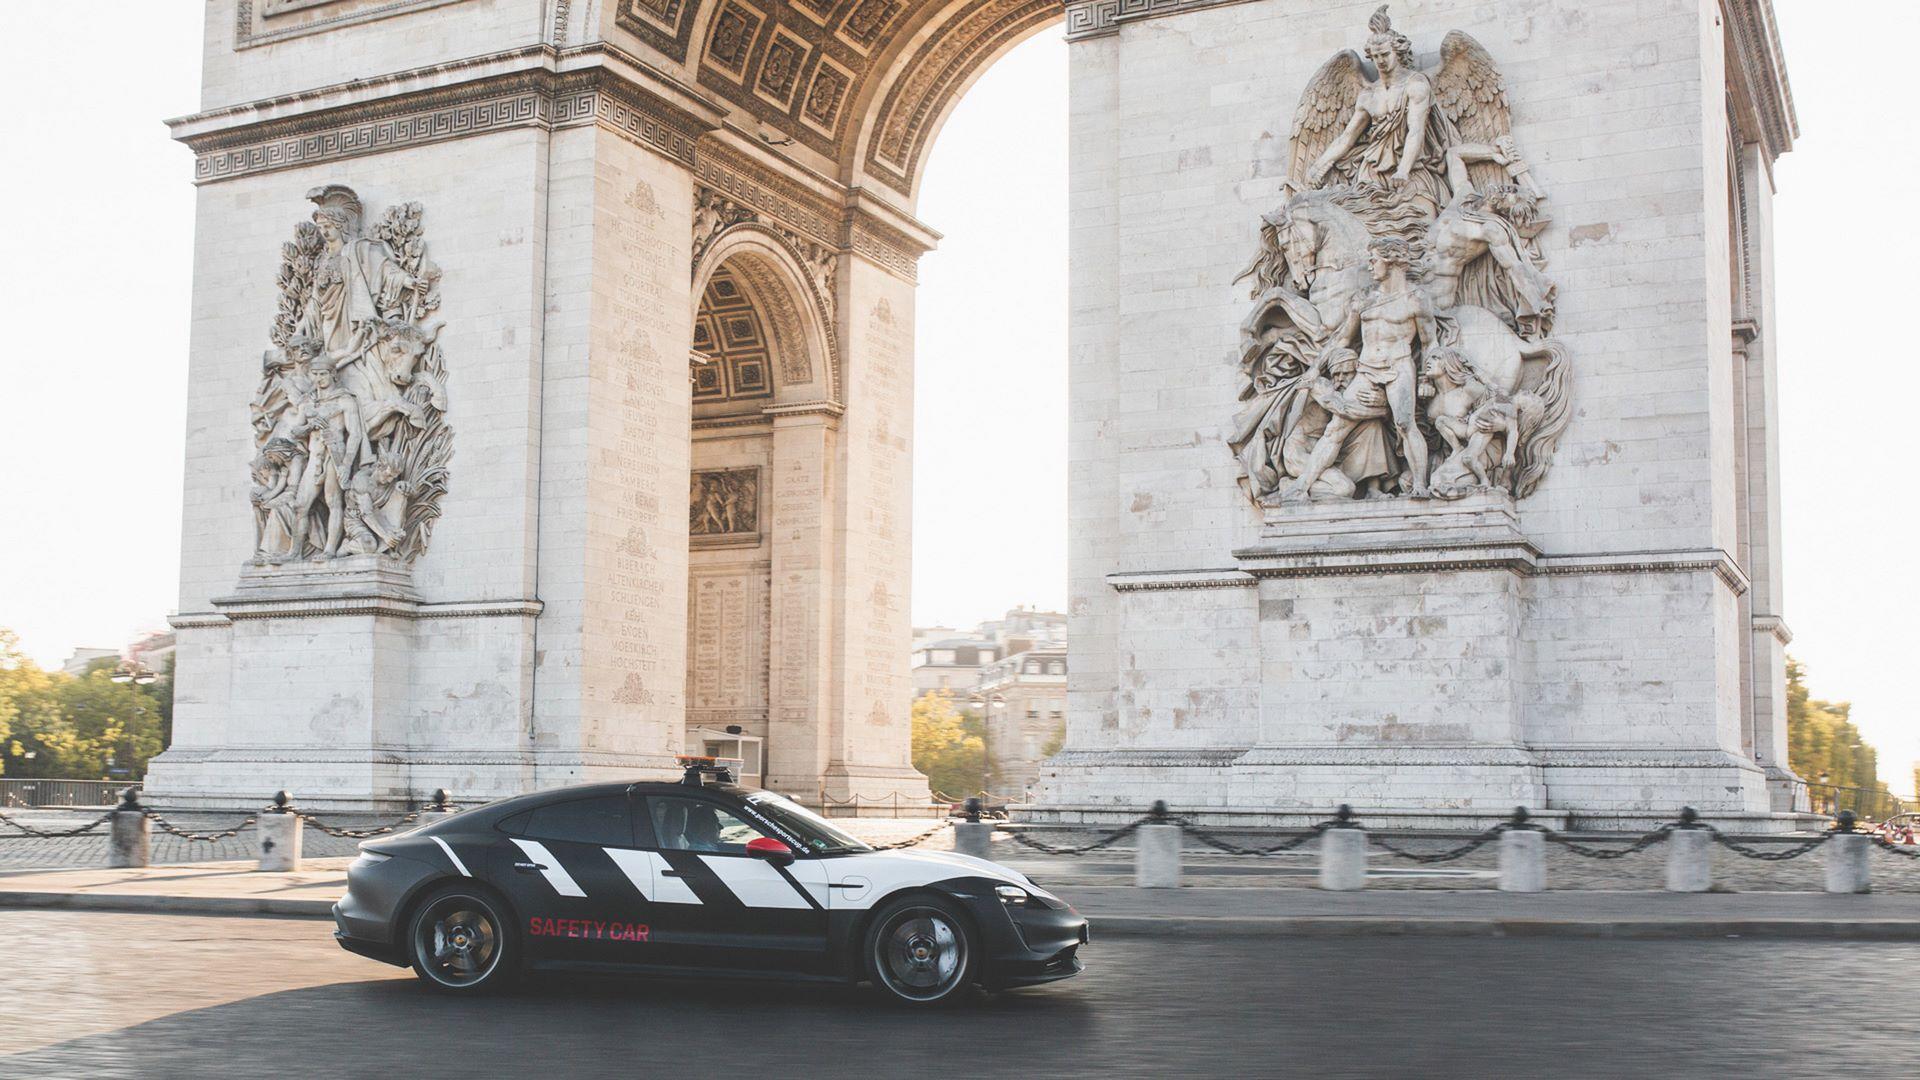 Porsche-Taycan-Turbo-safety-car-Le-Mans-2020-9